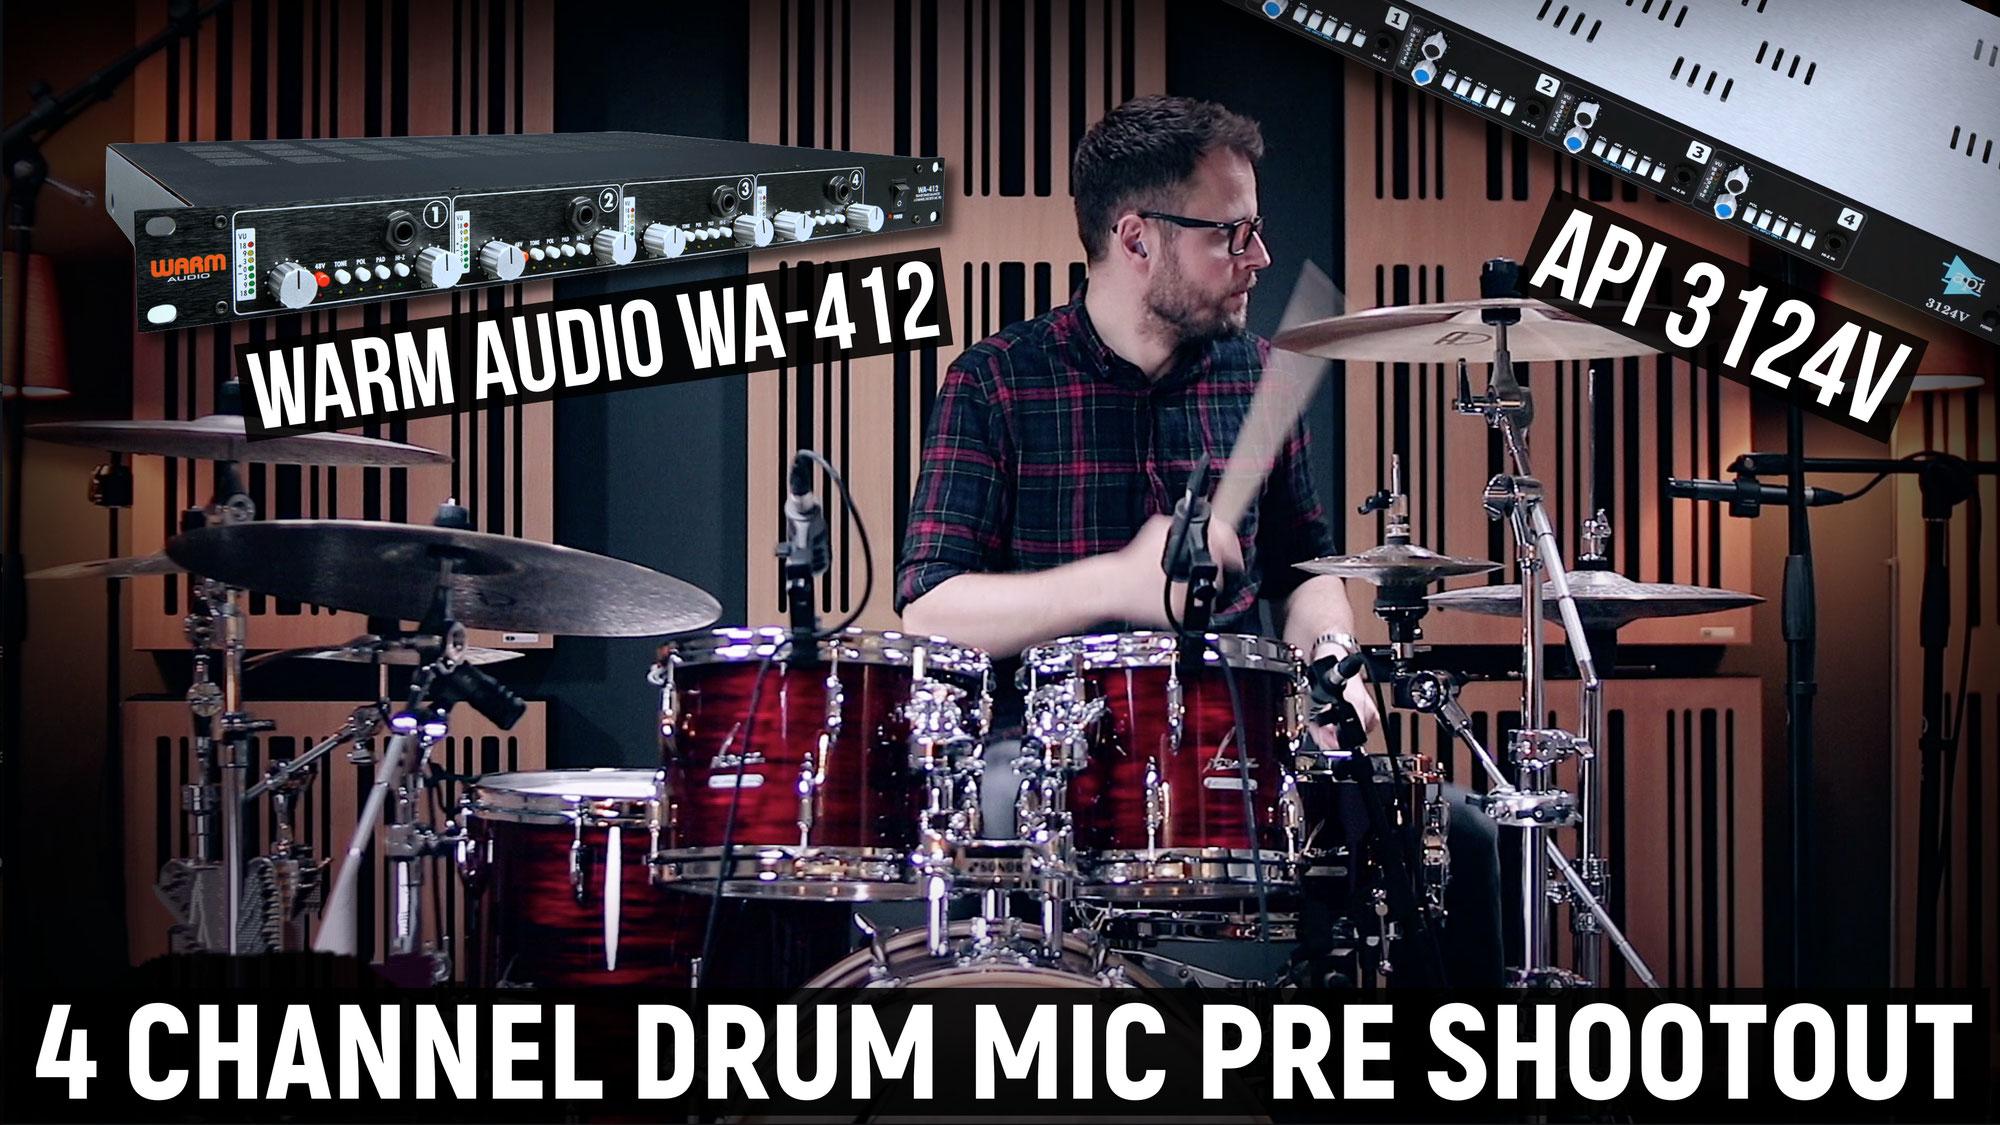 API 3124V vs WA-412 mic pre shootout video feature